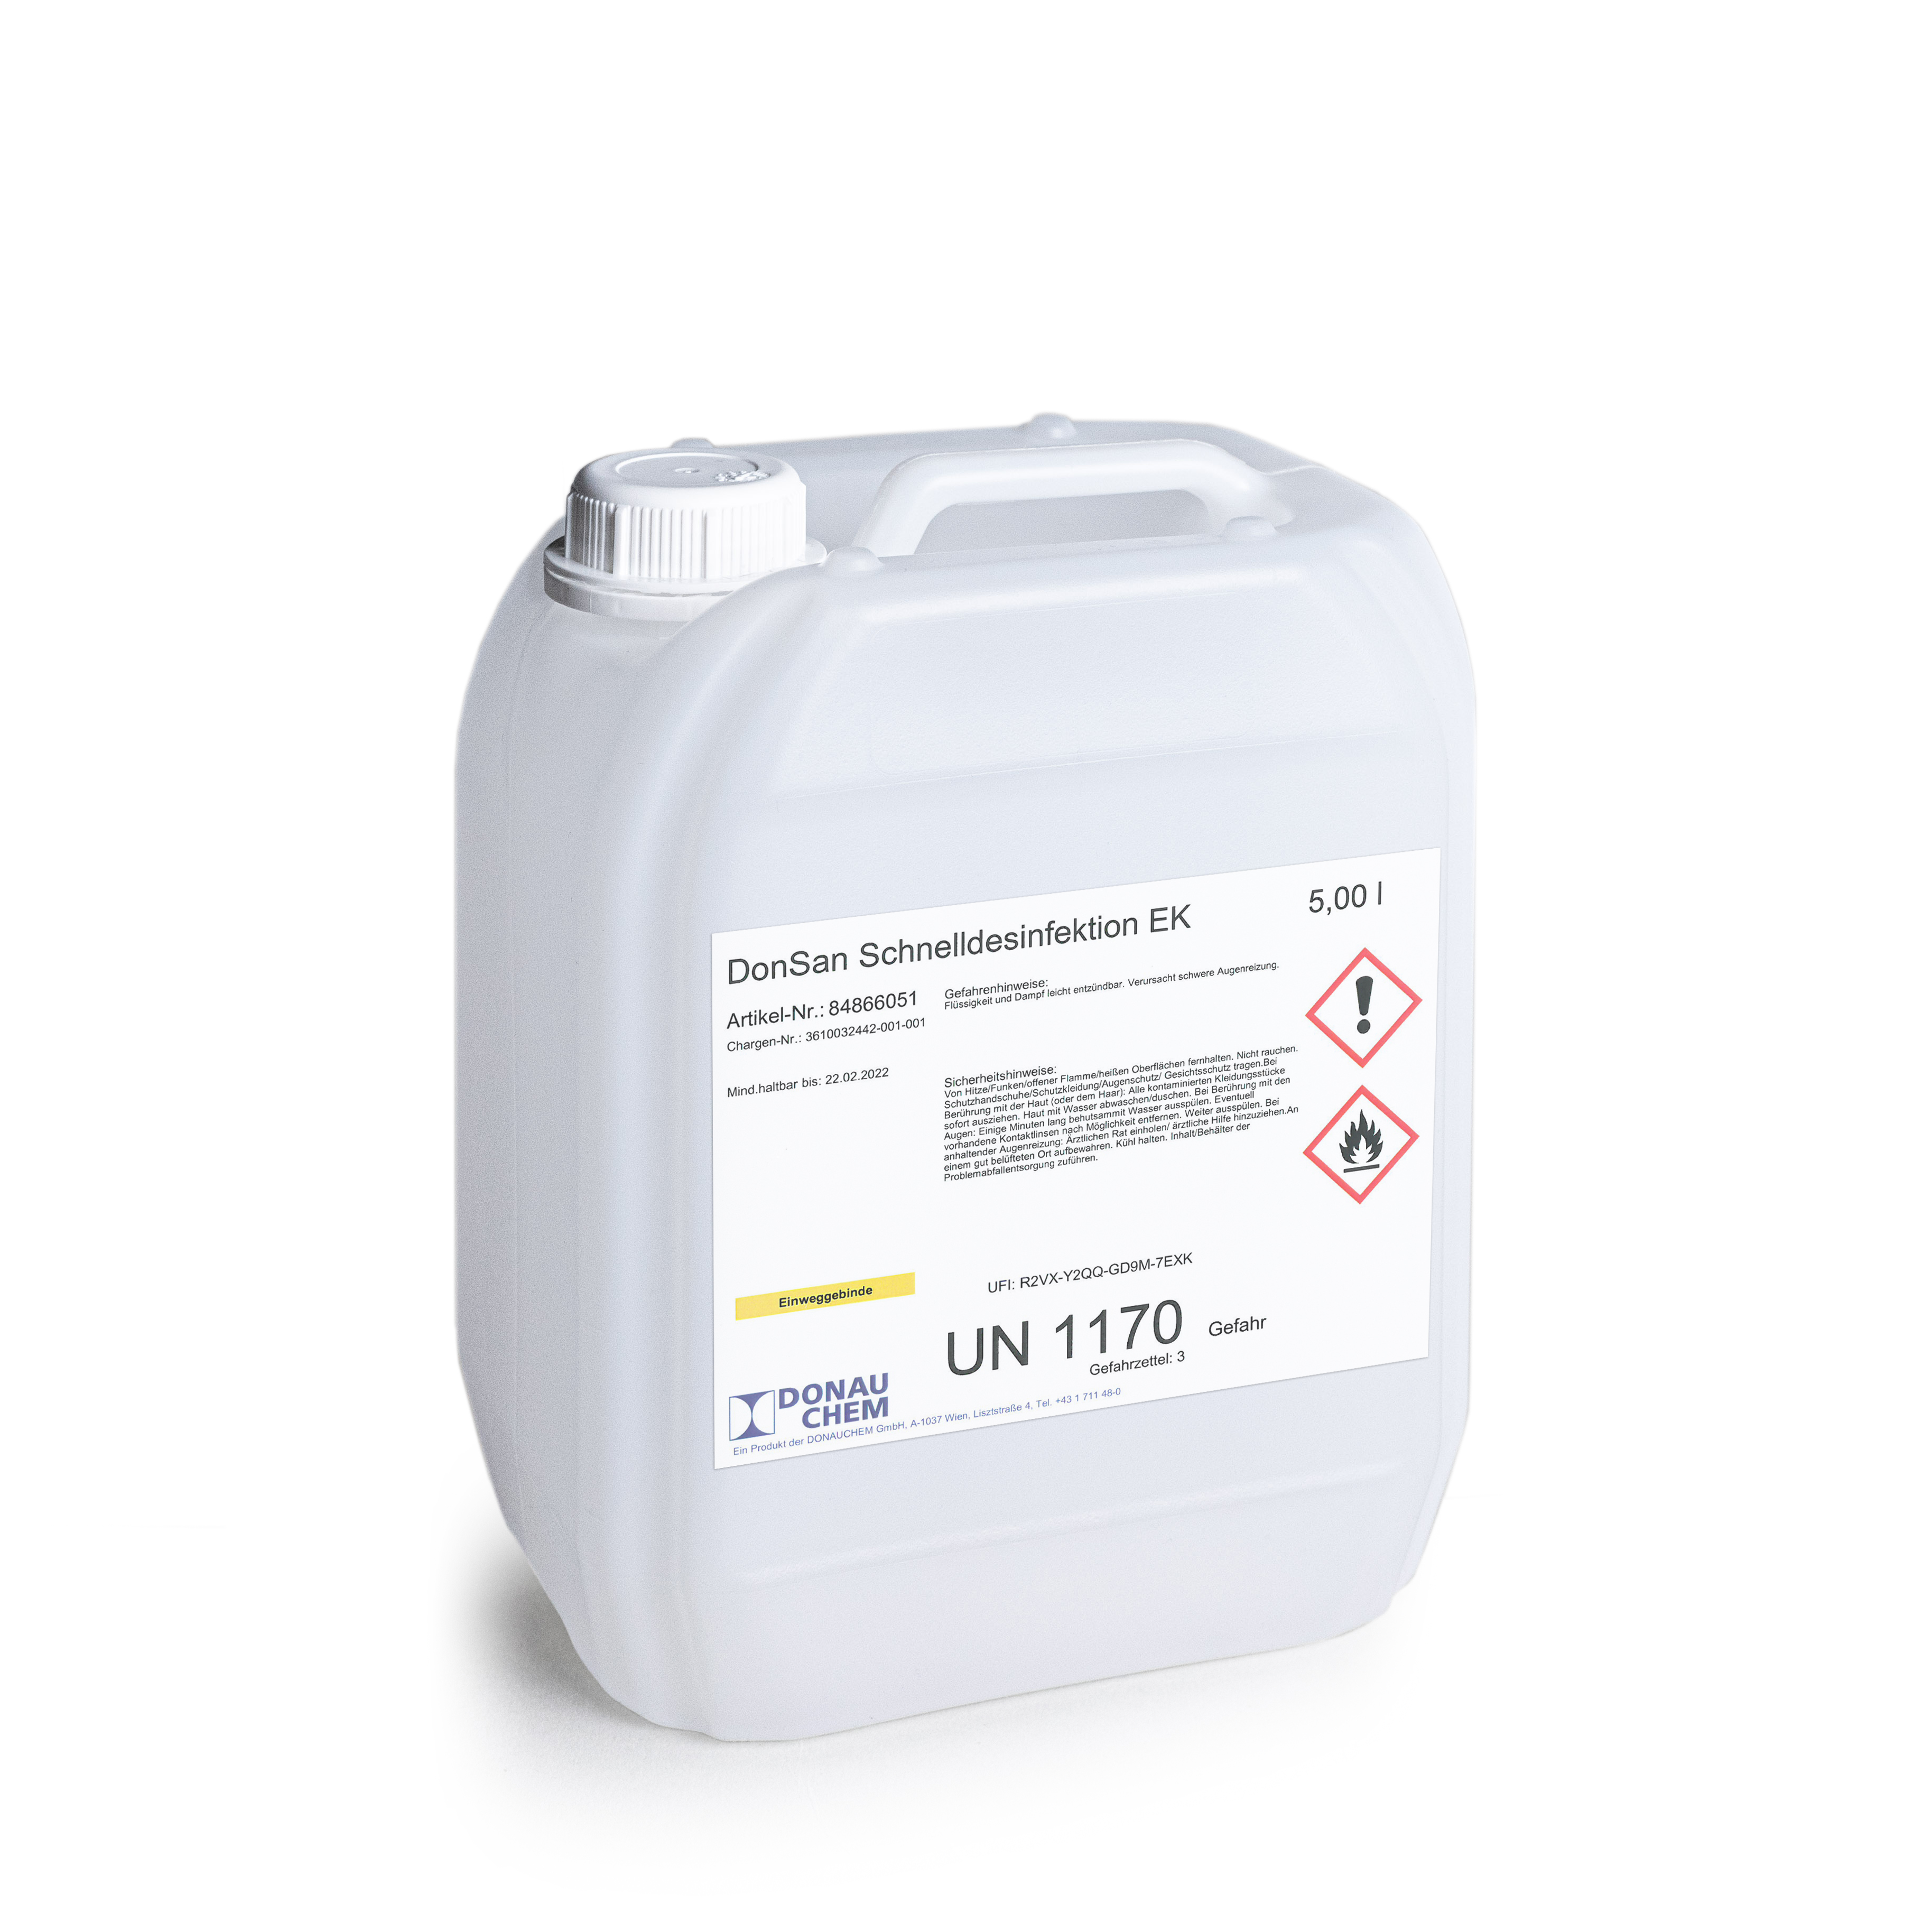 DonSan Schnelldesinfektion EK (Ethanol)